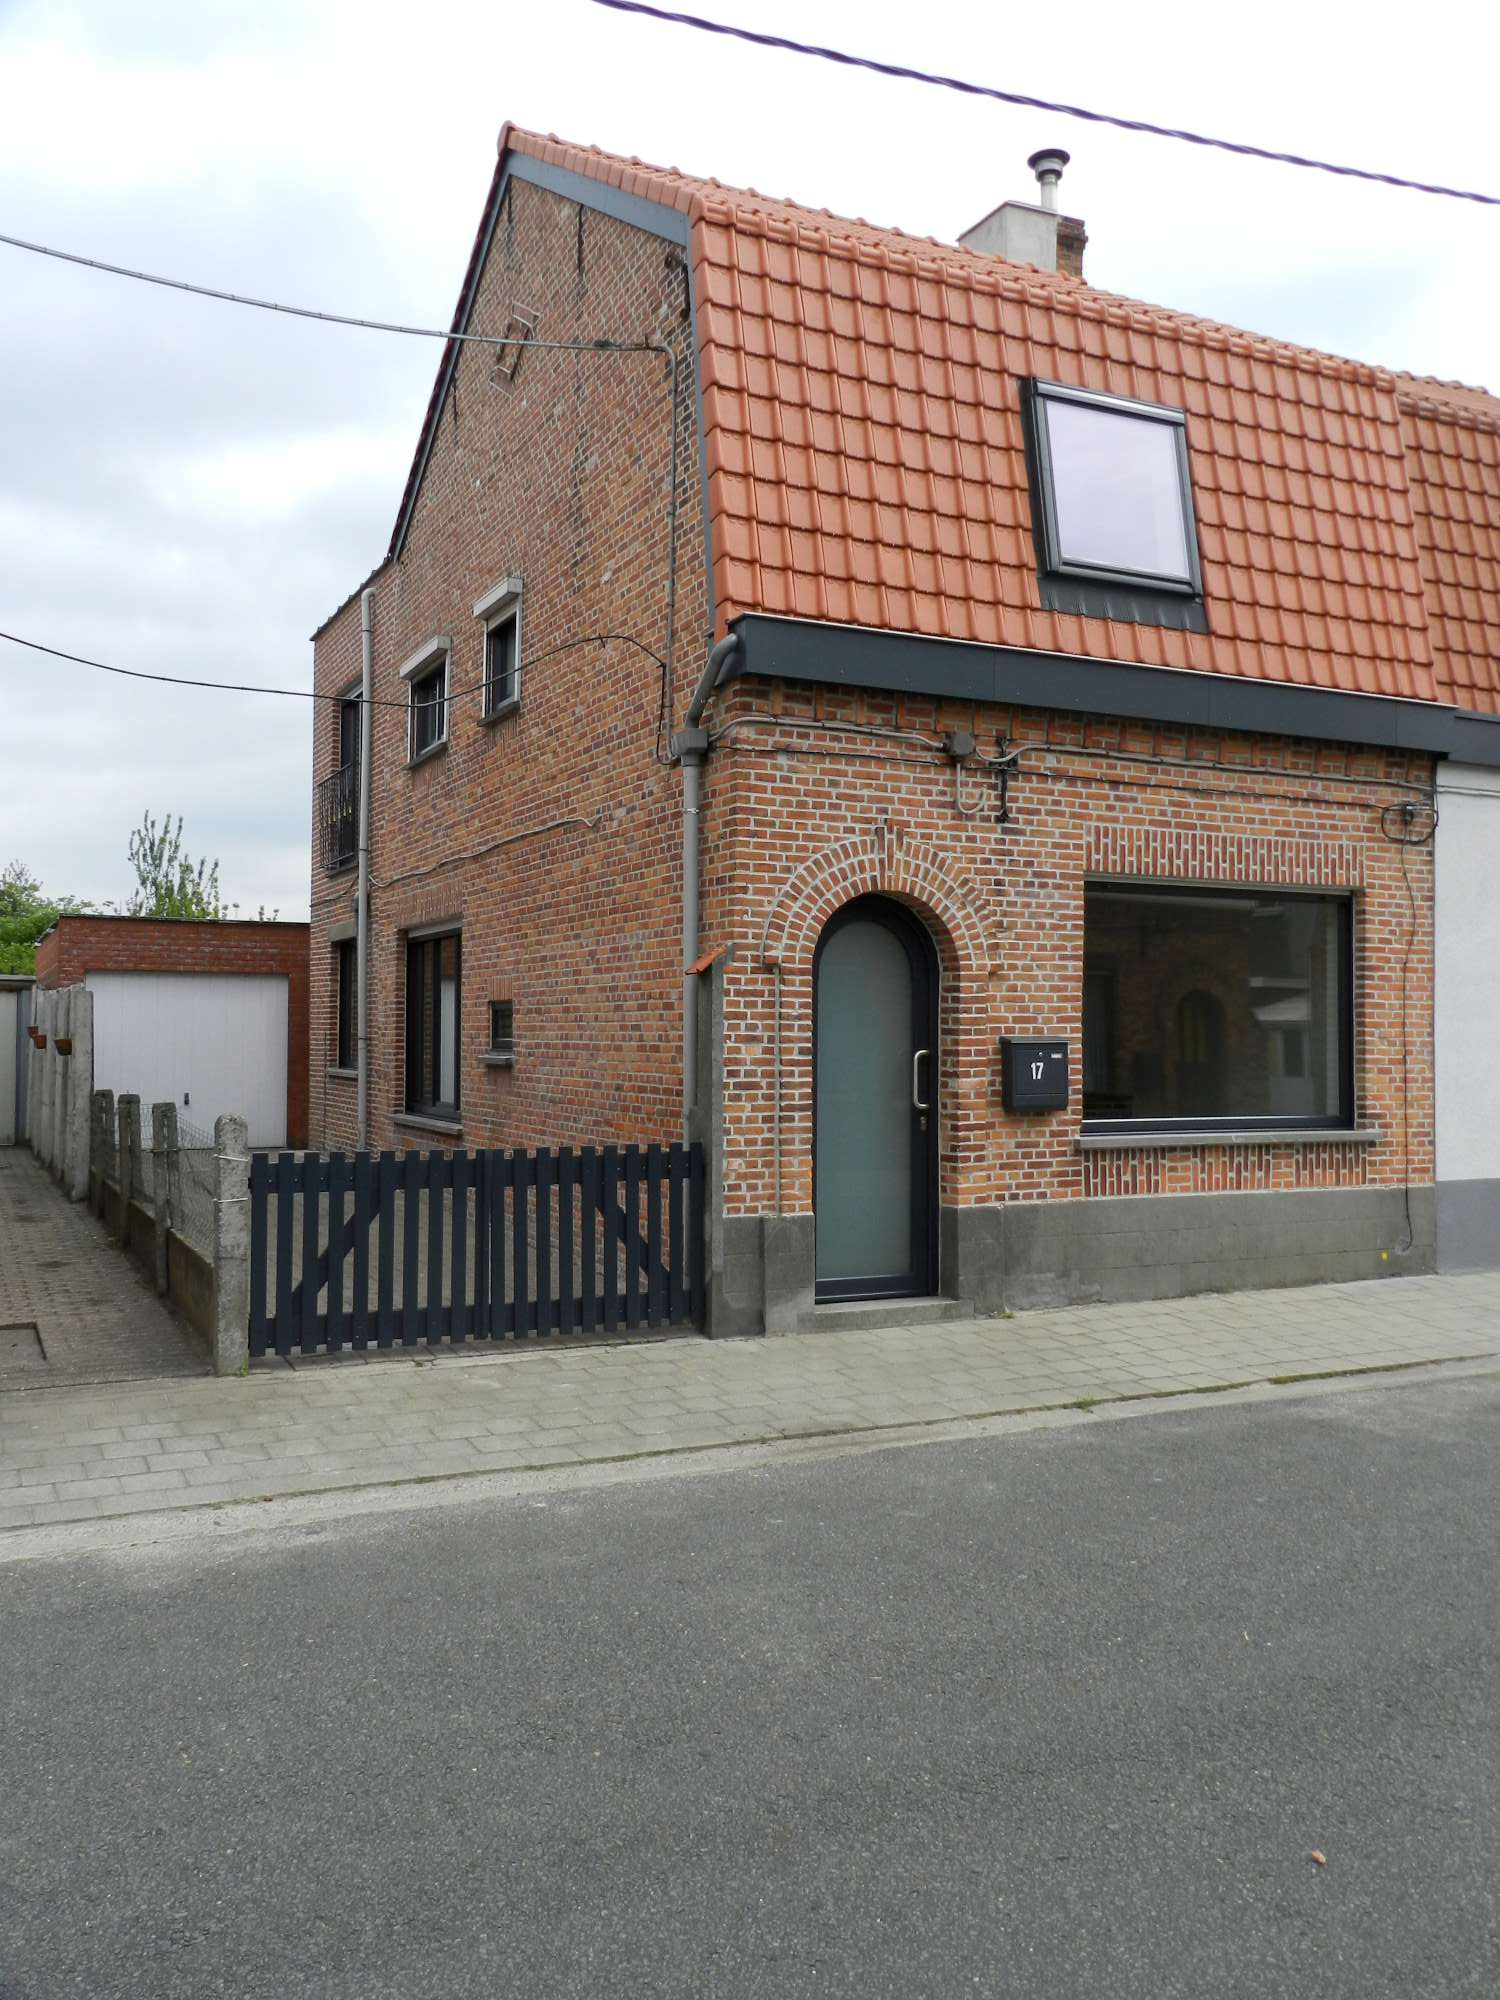 TE HUUR Instapklare woning met 2 slaapkamers  Beke Tuinwijk 17 – Waarschoot